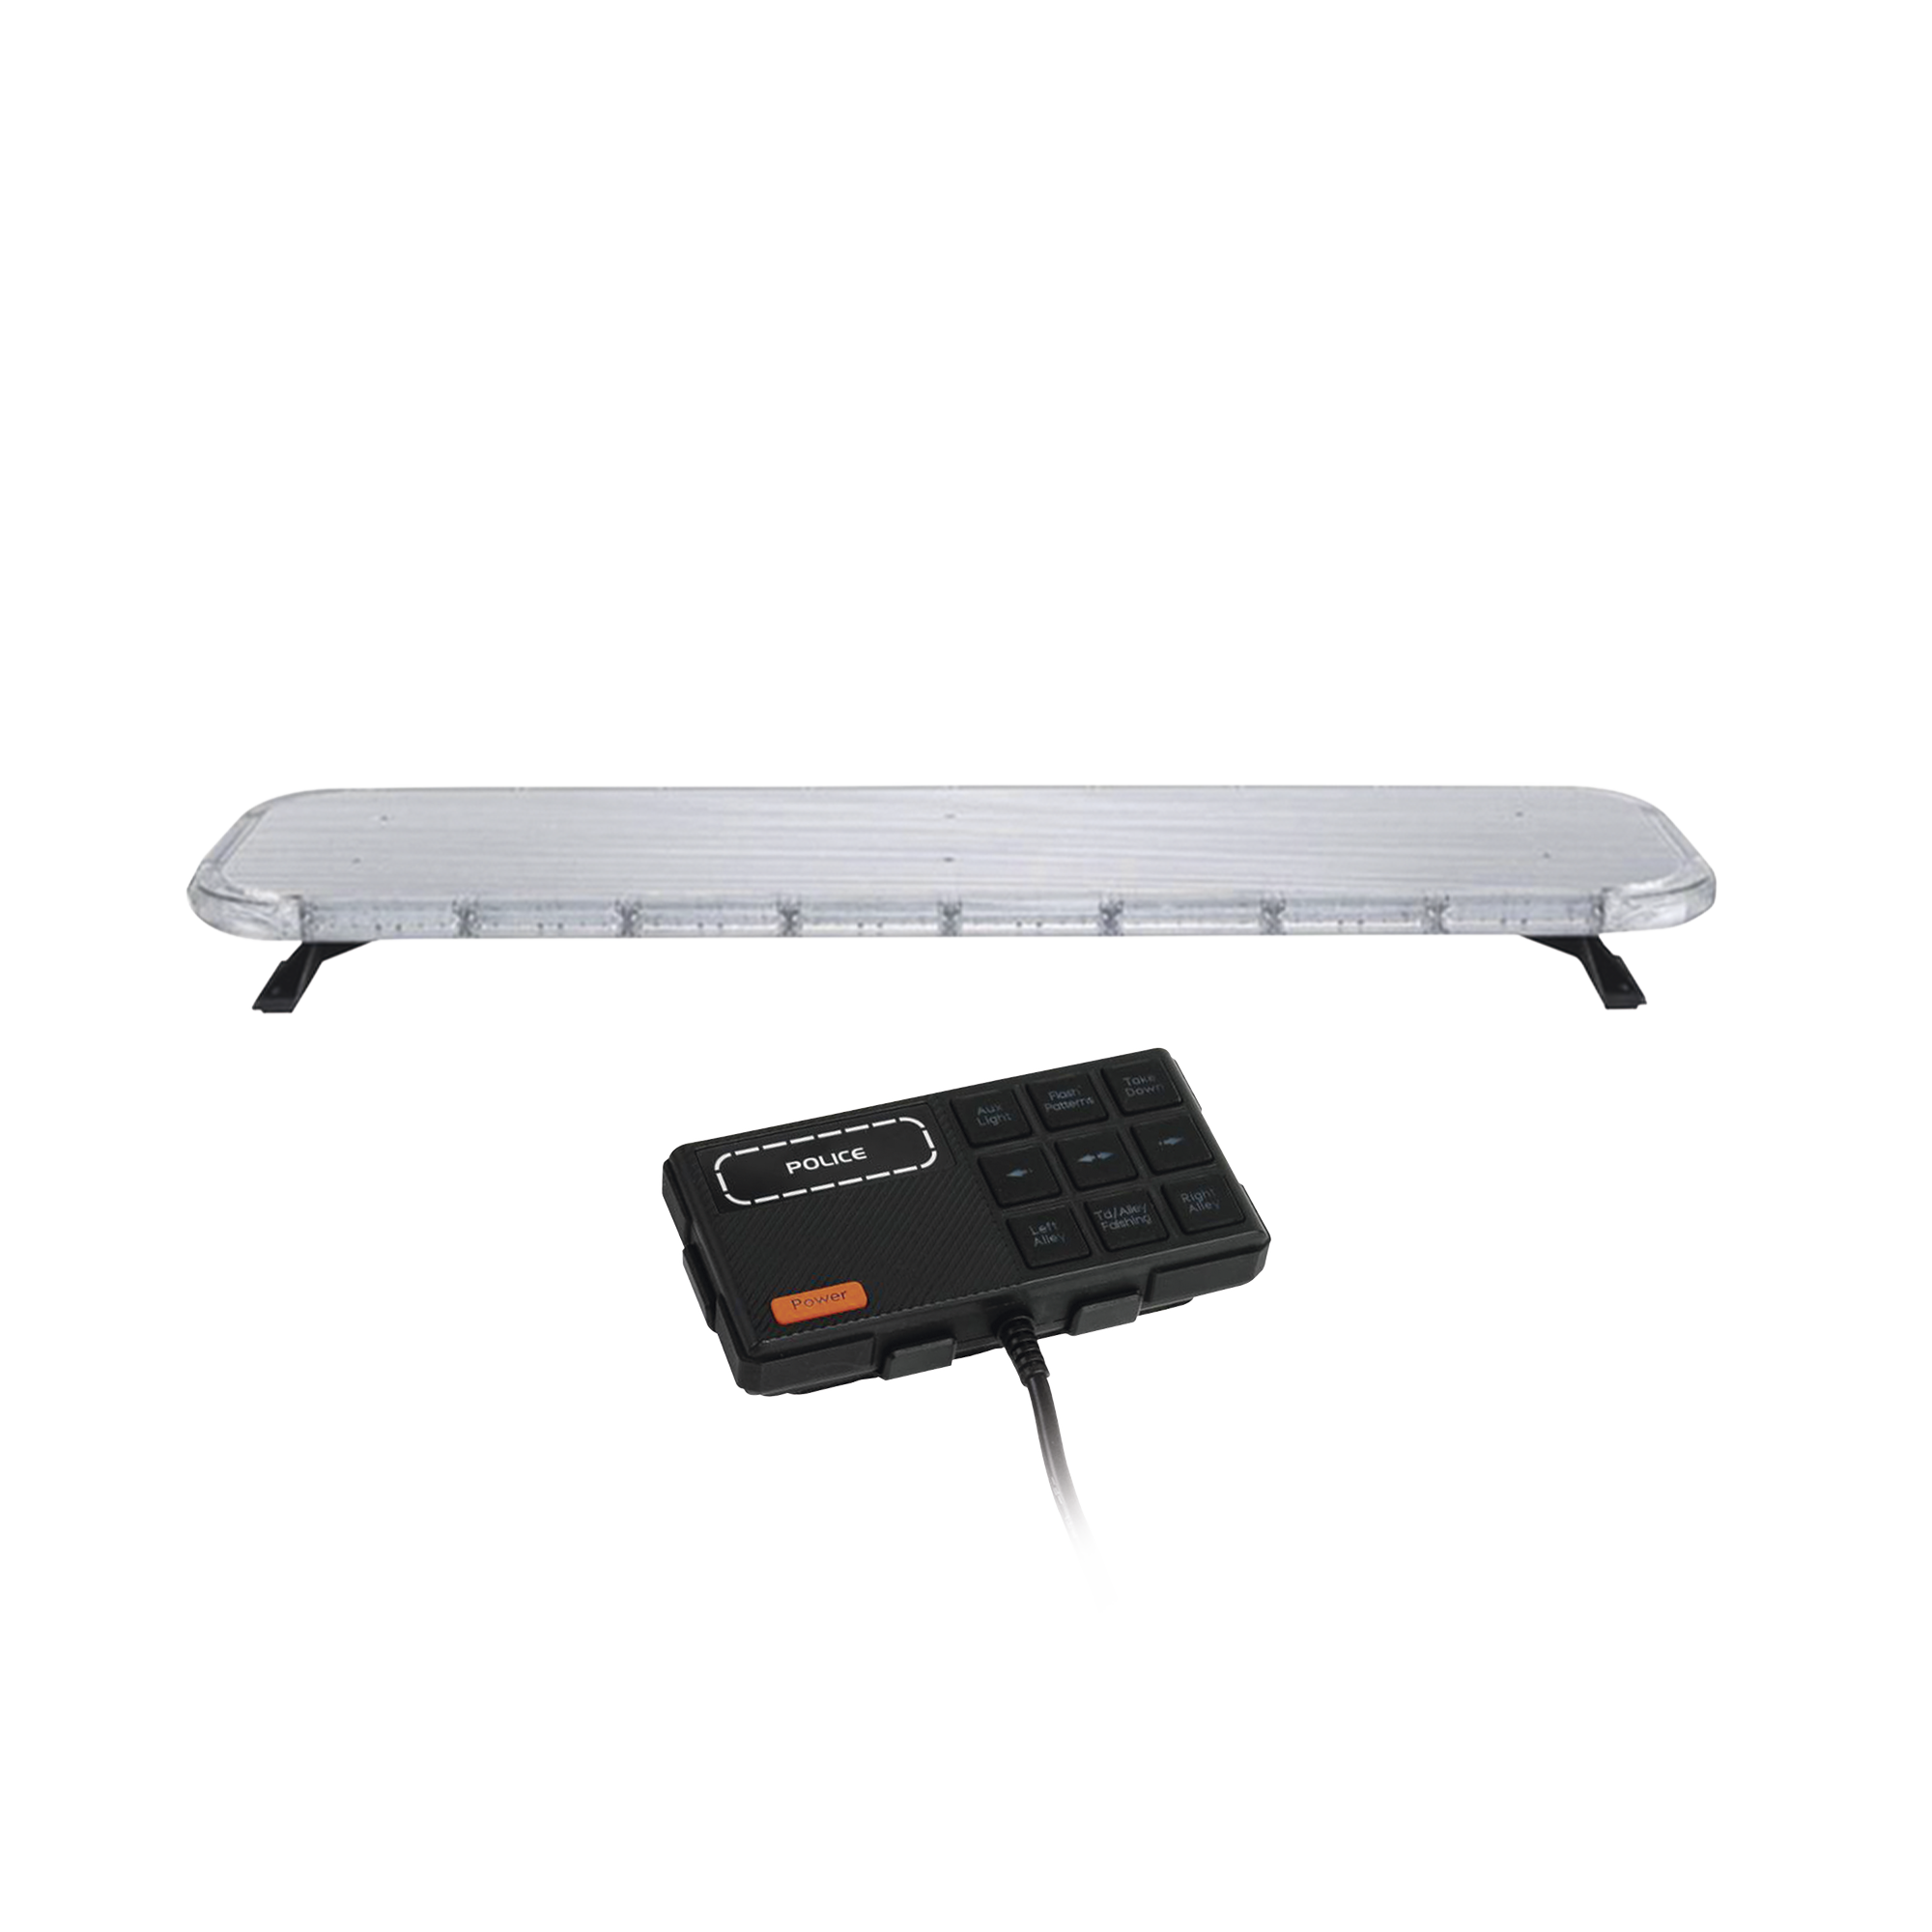 Barra de luces LED de 47 Rojo/Azul , De 132 LEDs, Controlador Incluido, Ideal para Equipar Unidades de Seguridad Publica